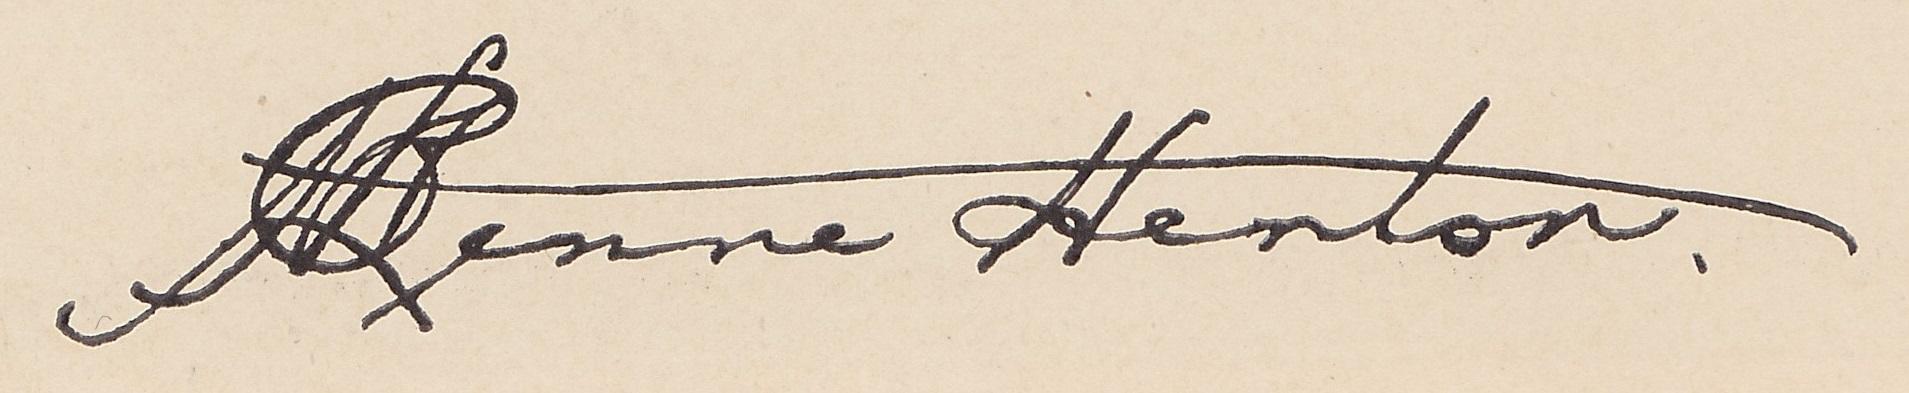 File:H. Benne Henton signature 2.jpg - Wikimedia Commons